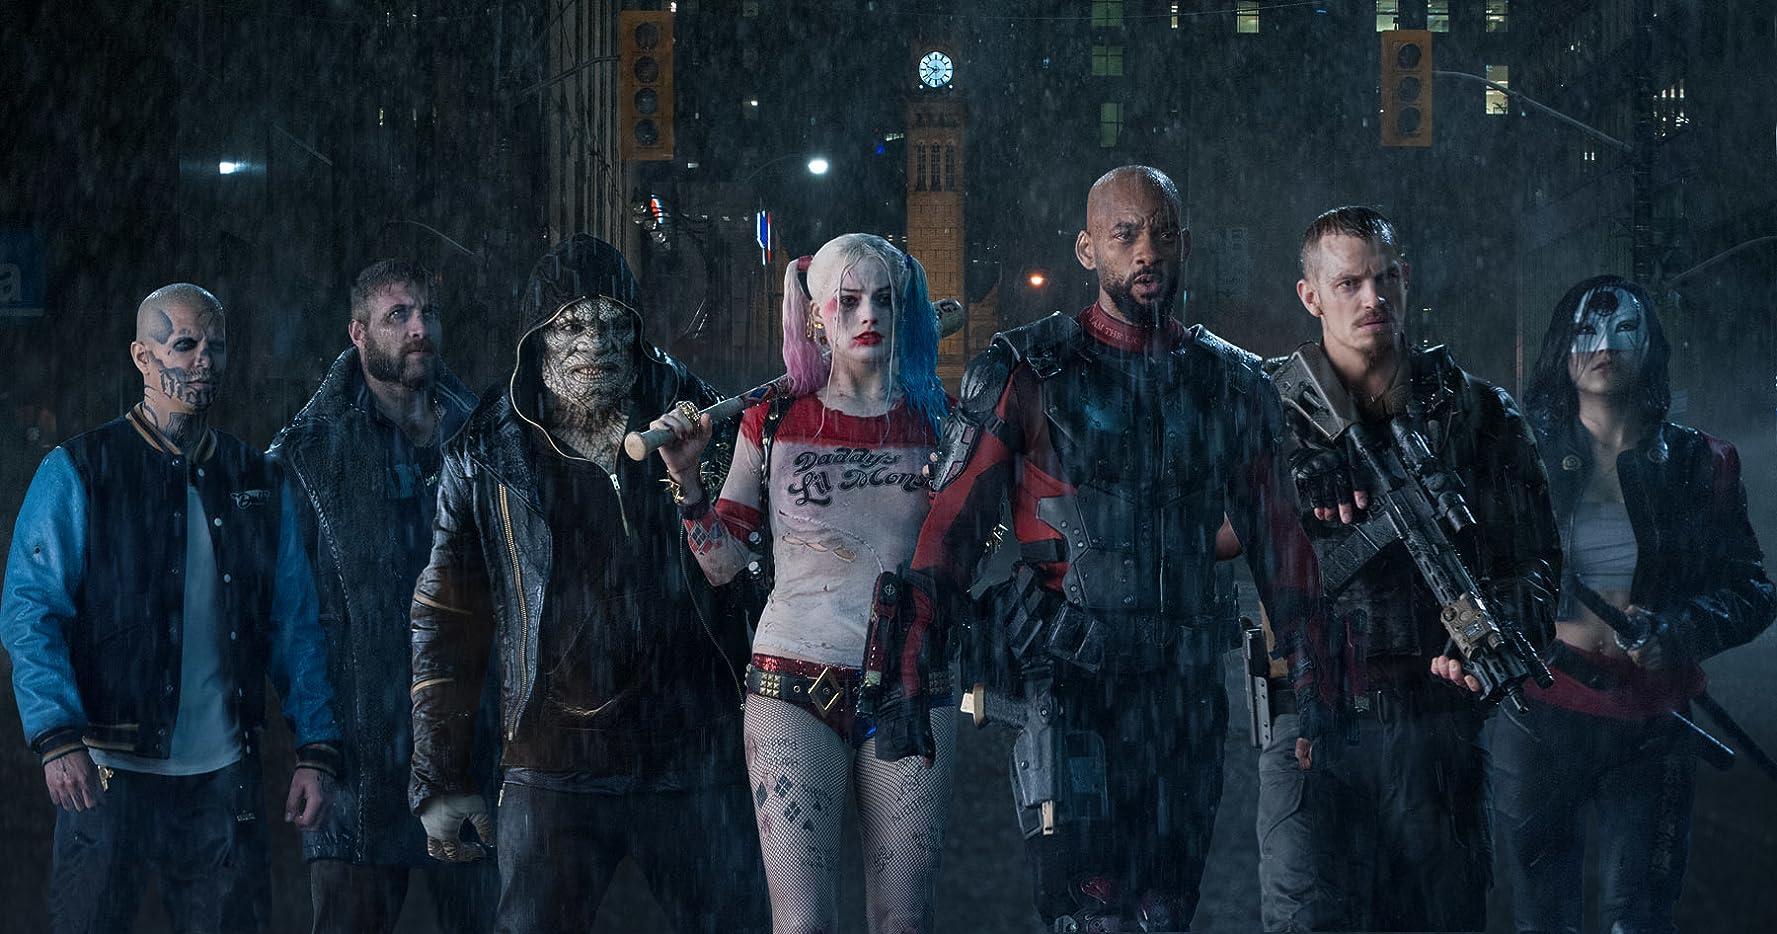 Will Smith, Adewale Akinnuoye-Agbaje, Jay Hernandez, Joel Kinnaman, Jai Courtney, Margot Robbie, and Karen Fukuhara in Suicide Squad (2016)